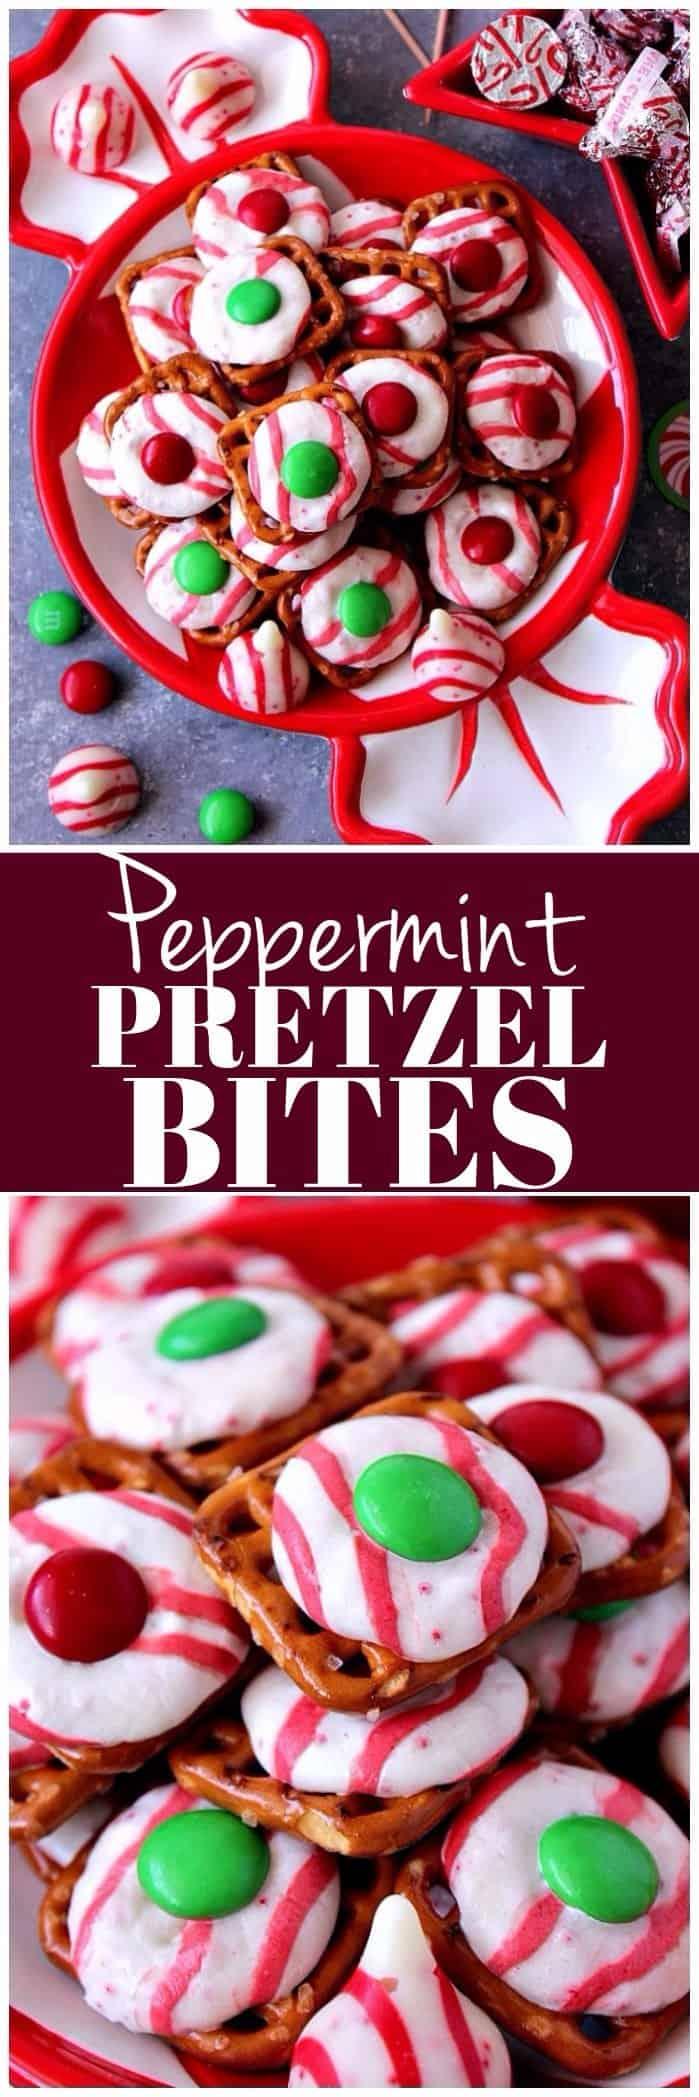 Peppermint Pretzel Bites recipe long1 Peppermint Pretzel Candy Recipe